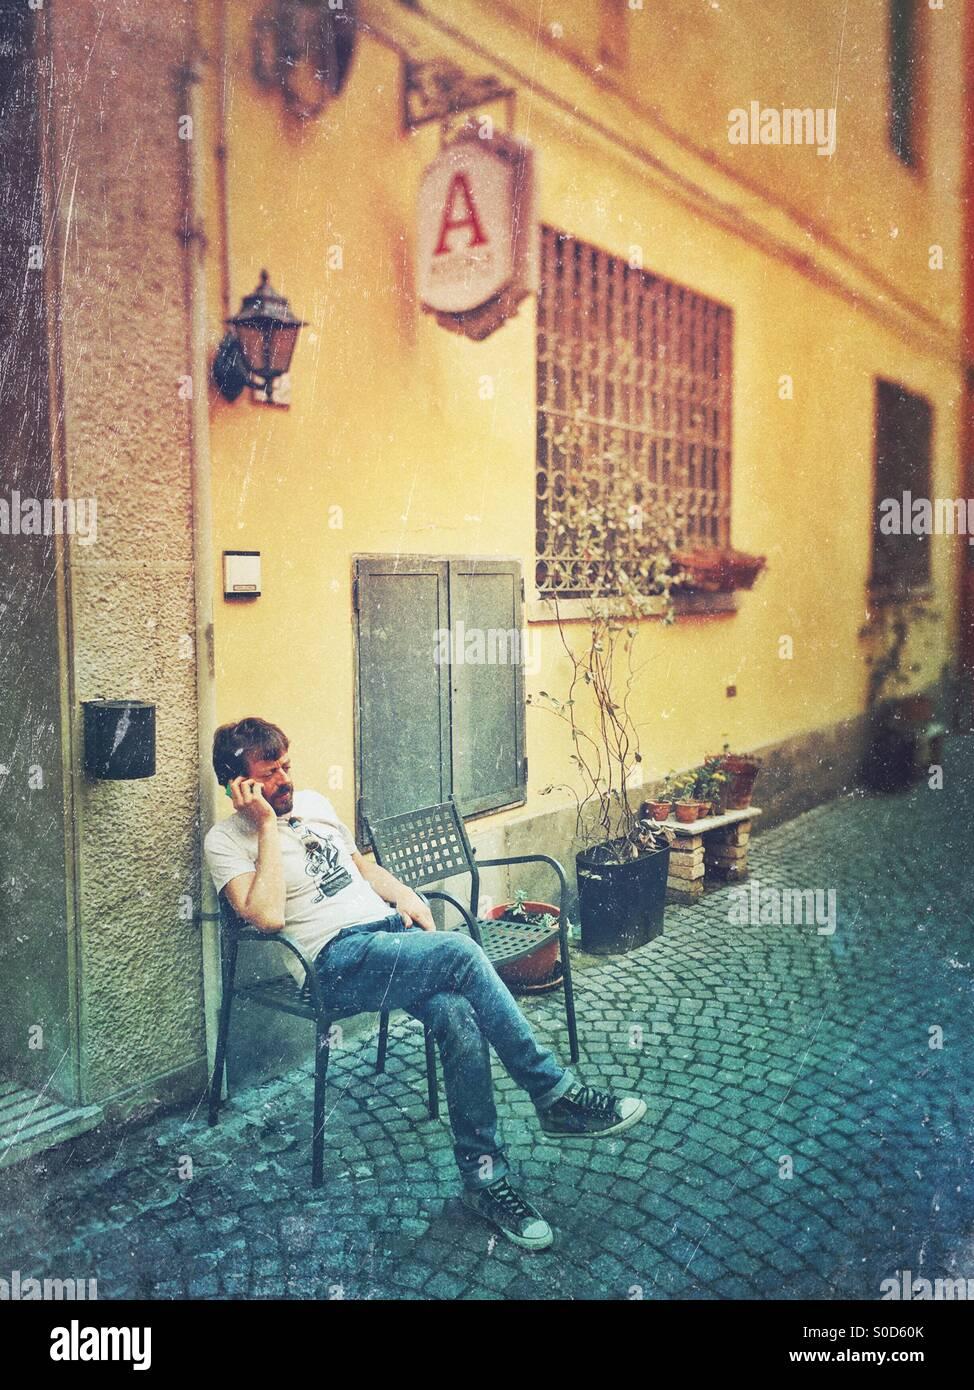 Street scene man at smartphone - Stock Image